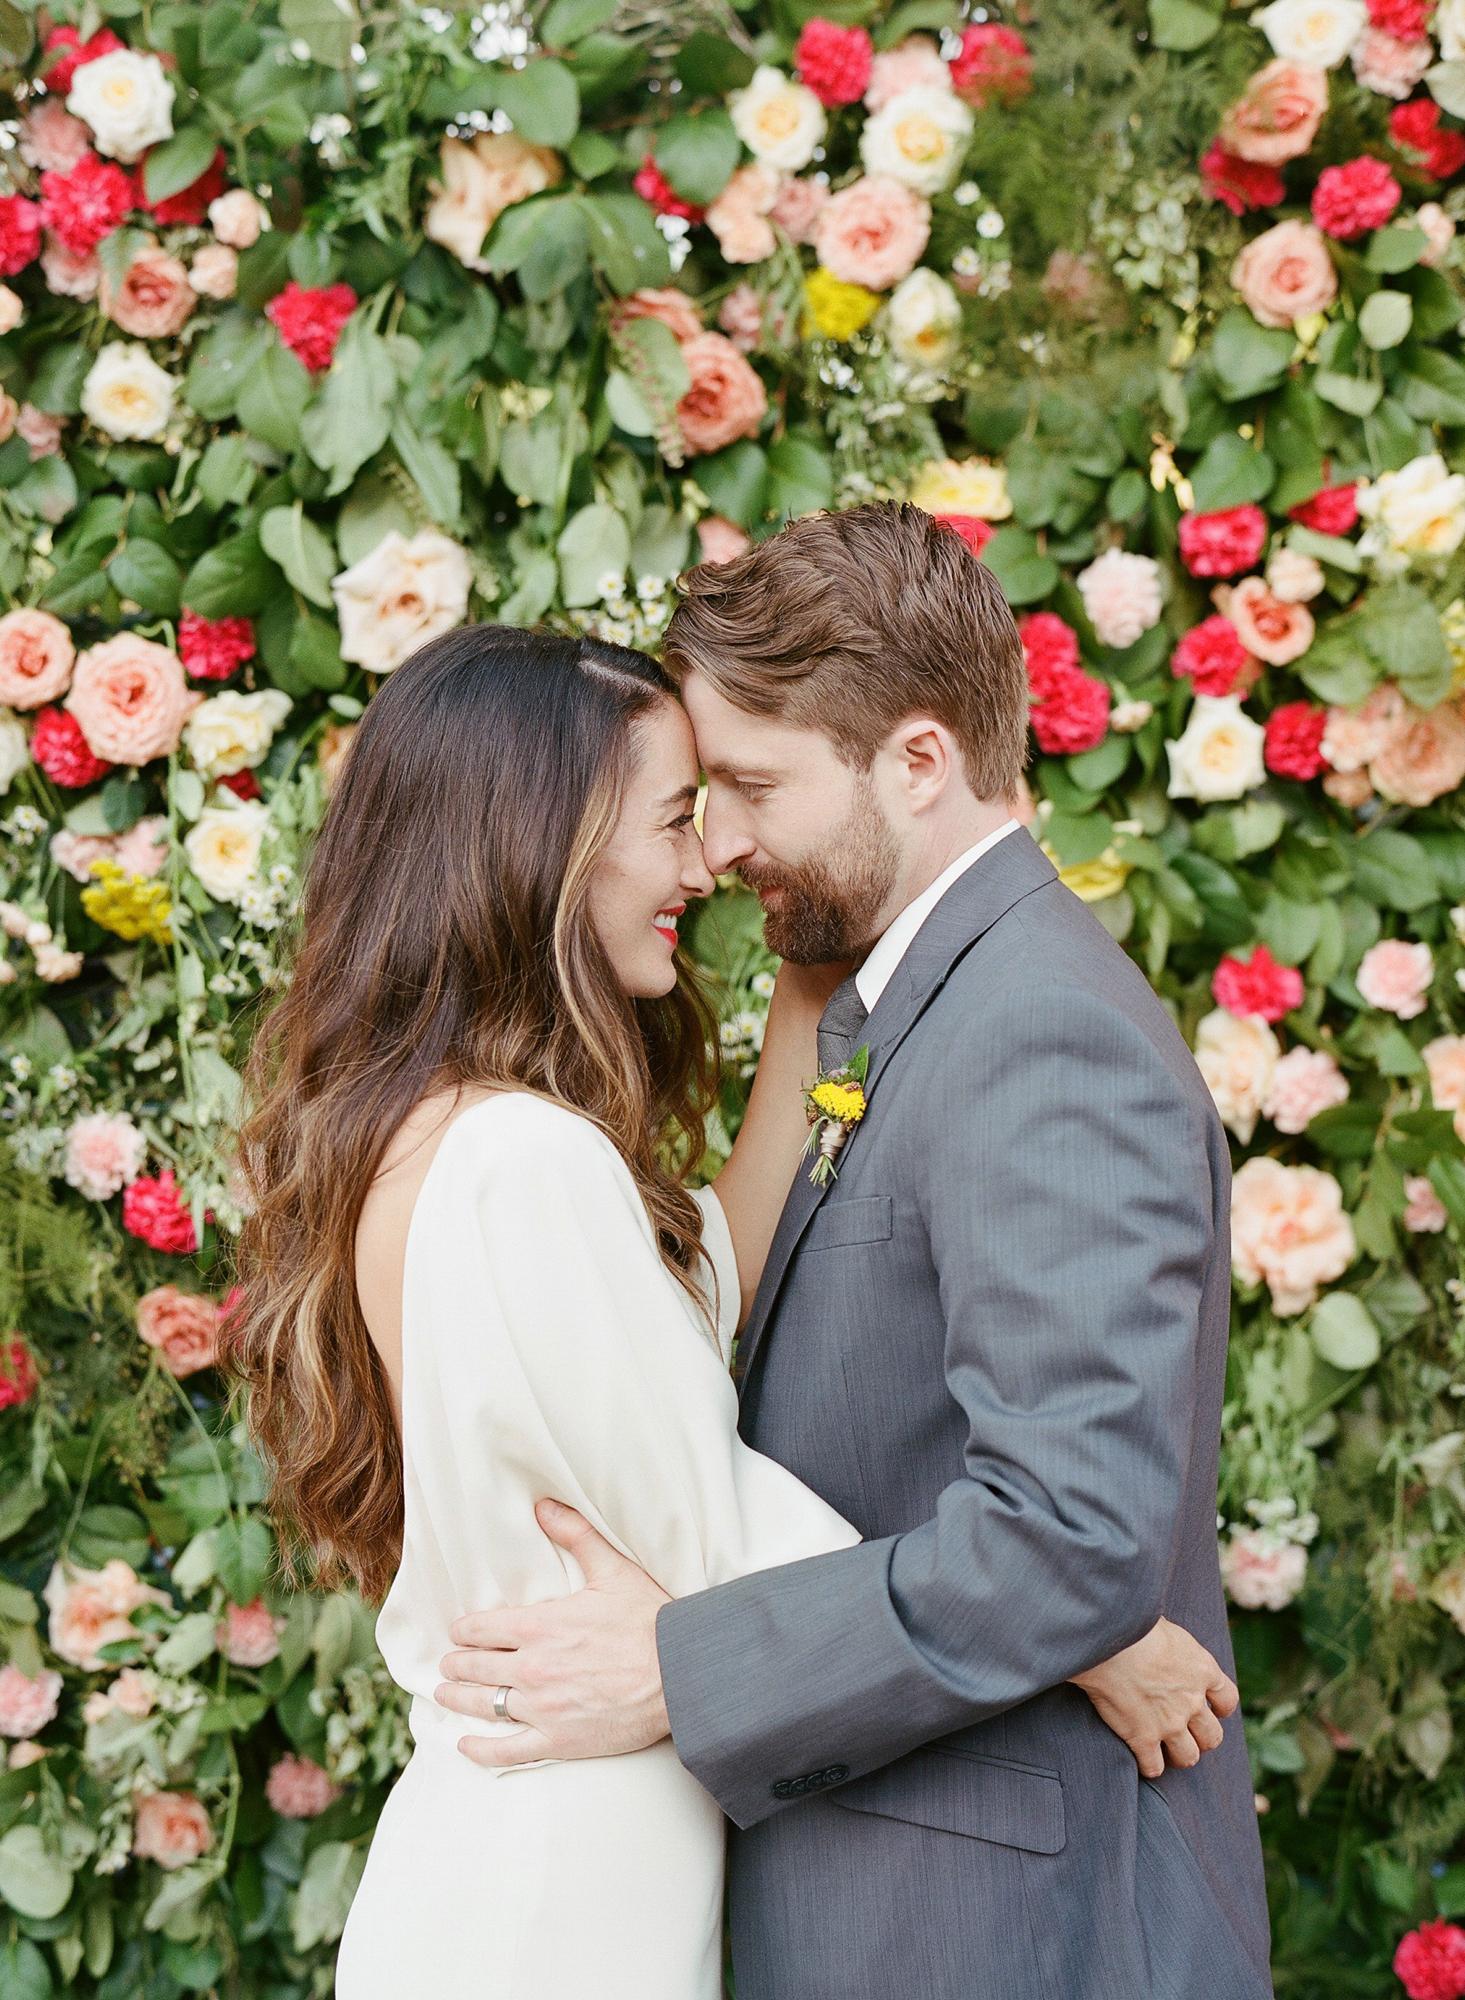 Rancho-Valencia-wedding-blooms-by-breesa-lee-rochelle-cheever-francine-ribeau-luxury-garden-rancho-santa-fe-hey-there-cupcake-adore-folklore-368.JPG